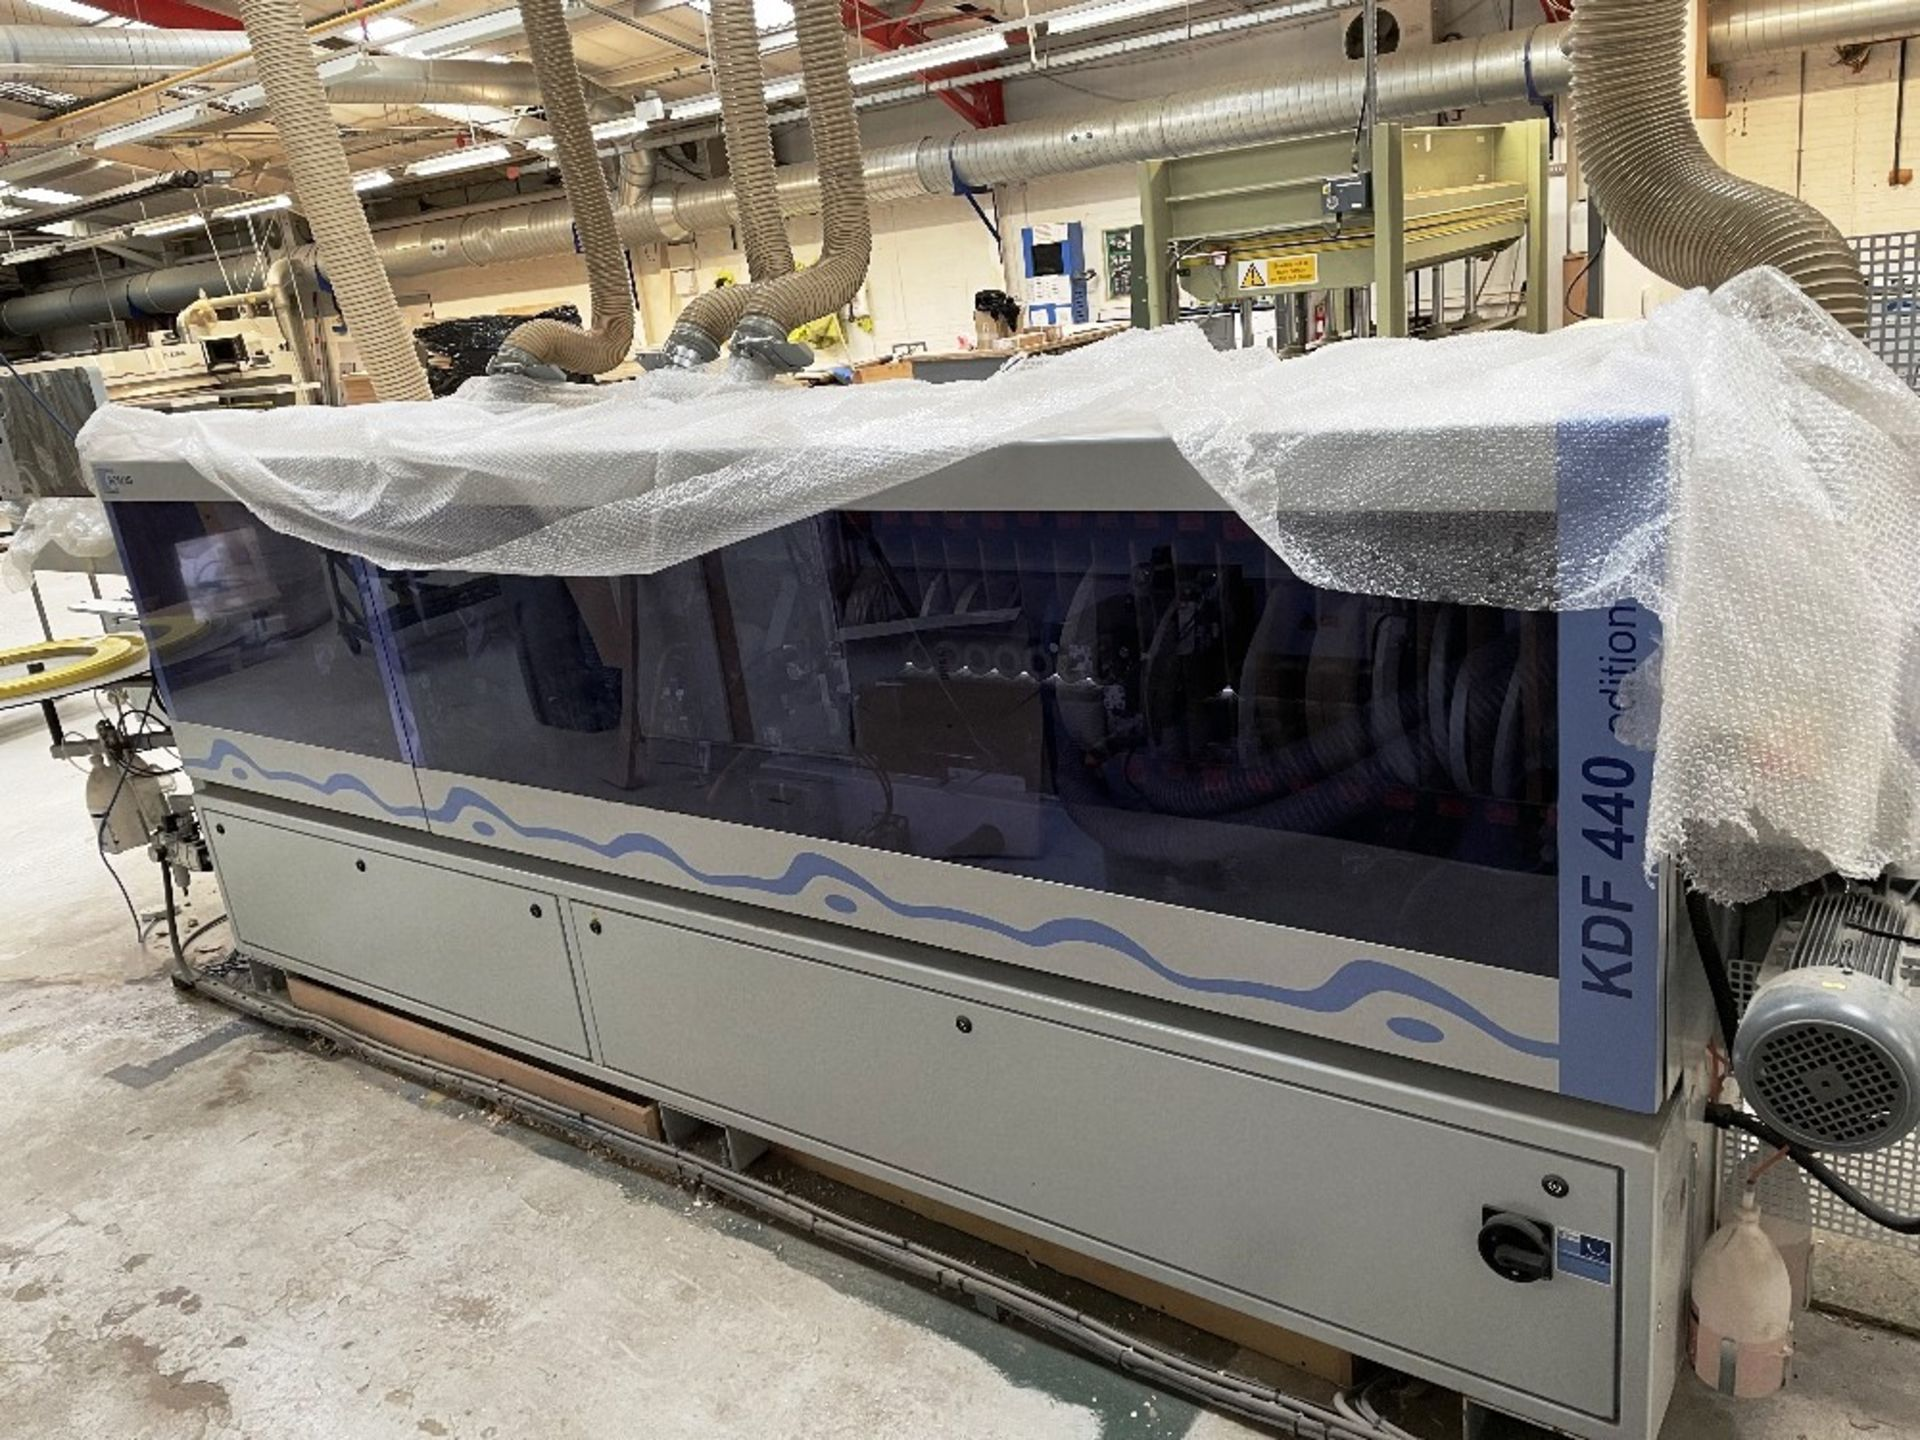 Homag KDF 440 C CNC Edgebander   YOM: 2017 - Image 2 of 4